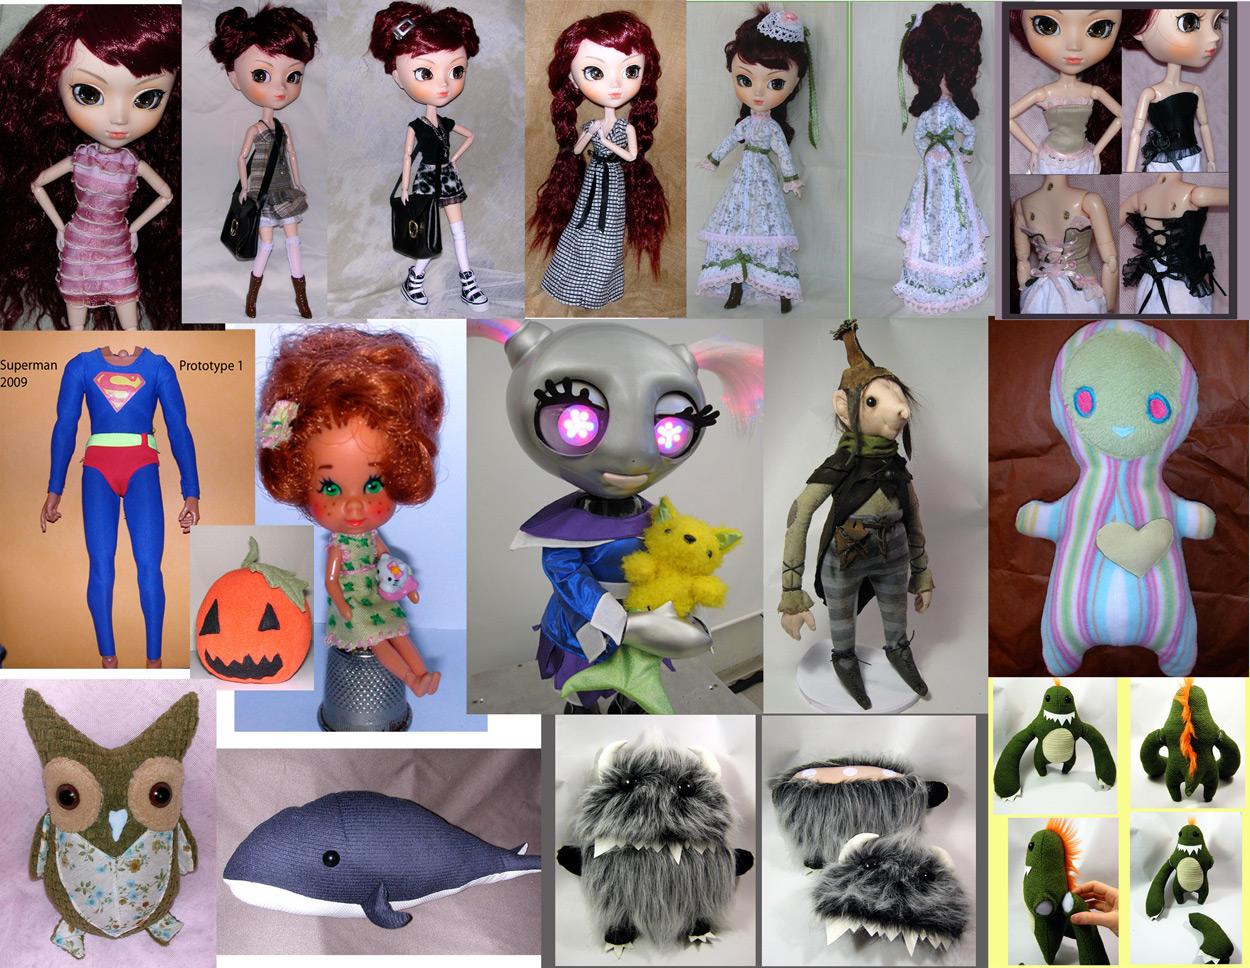 toys-collage1.jpg